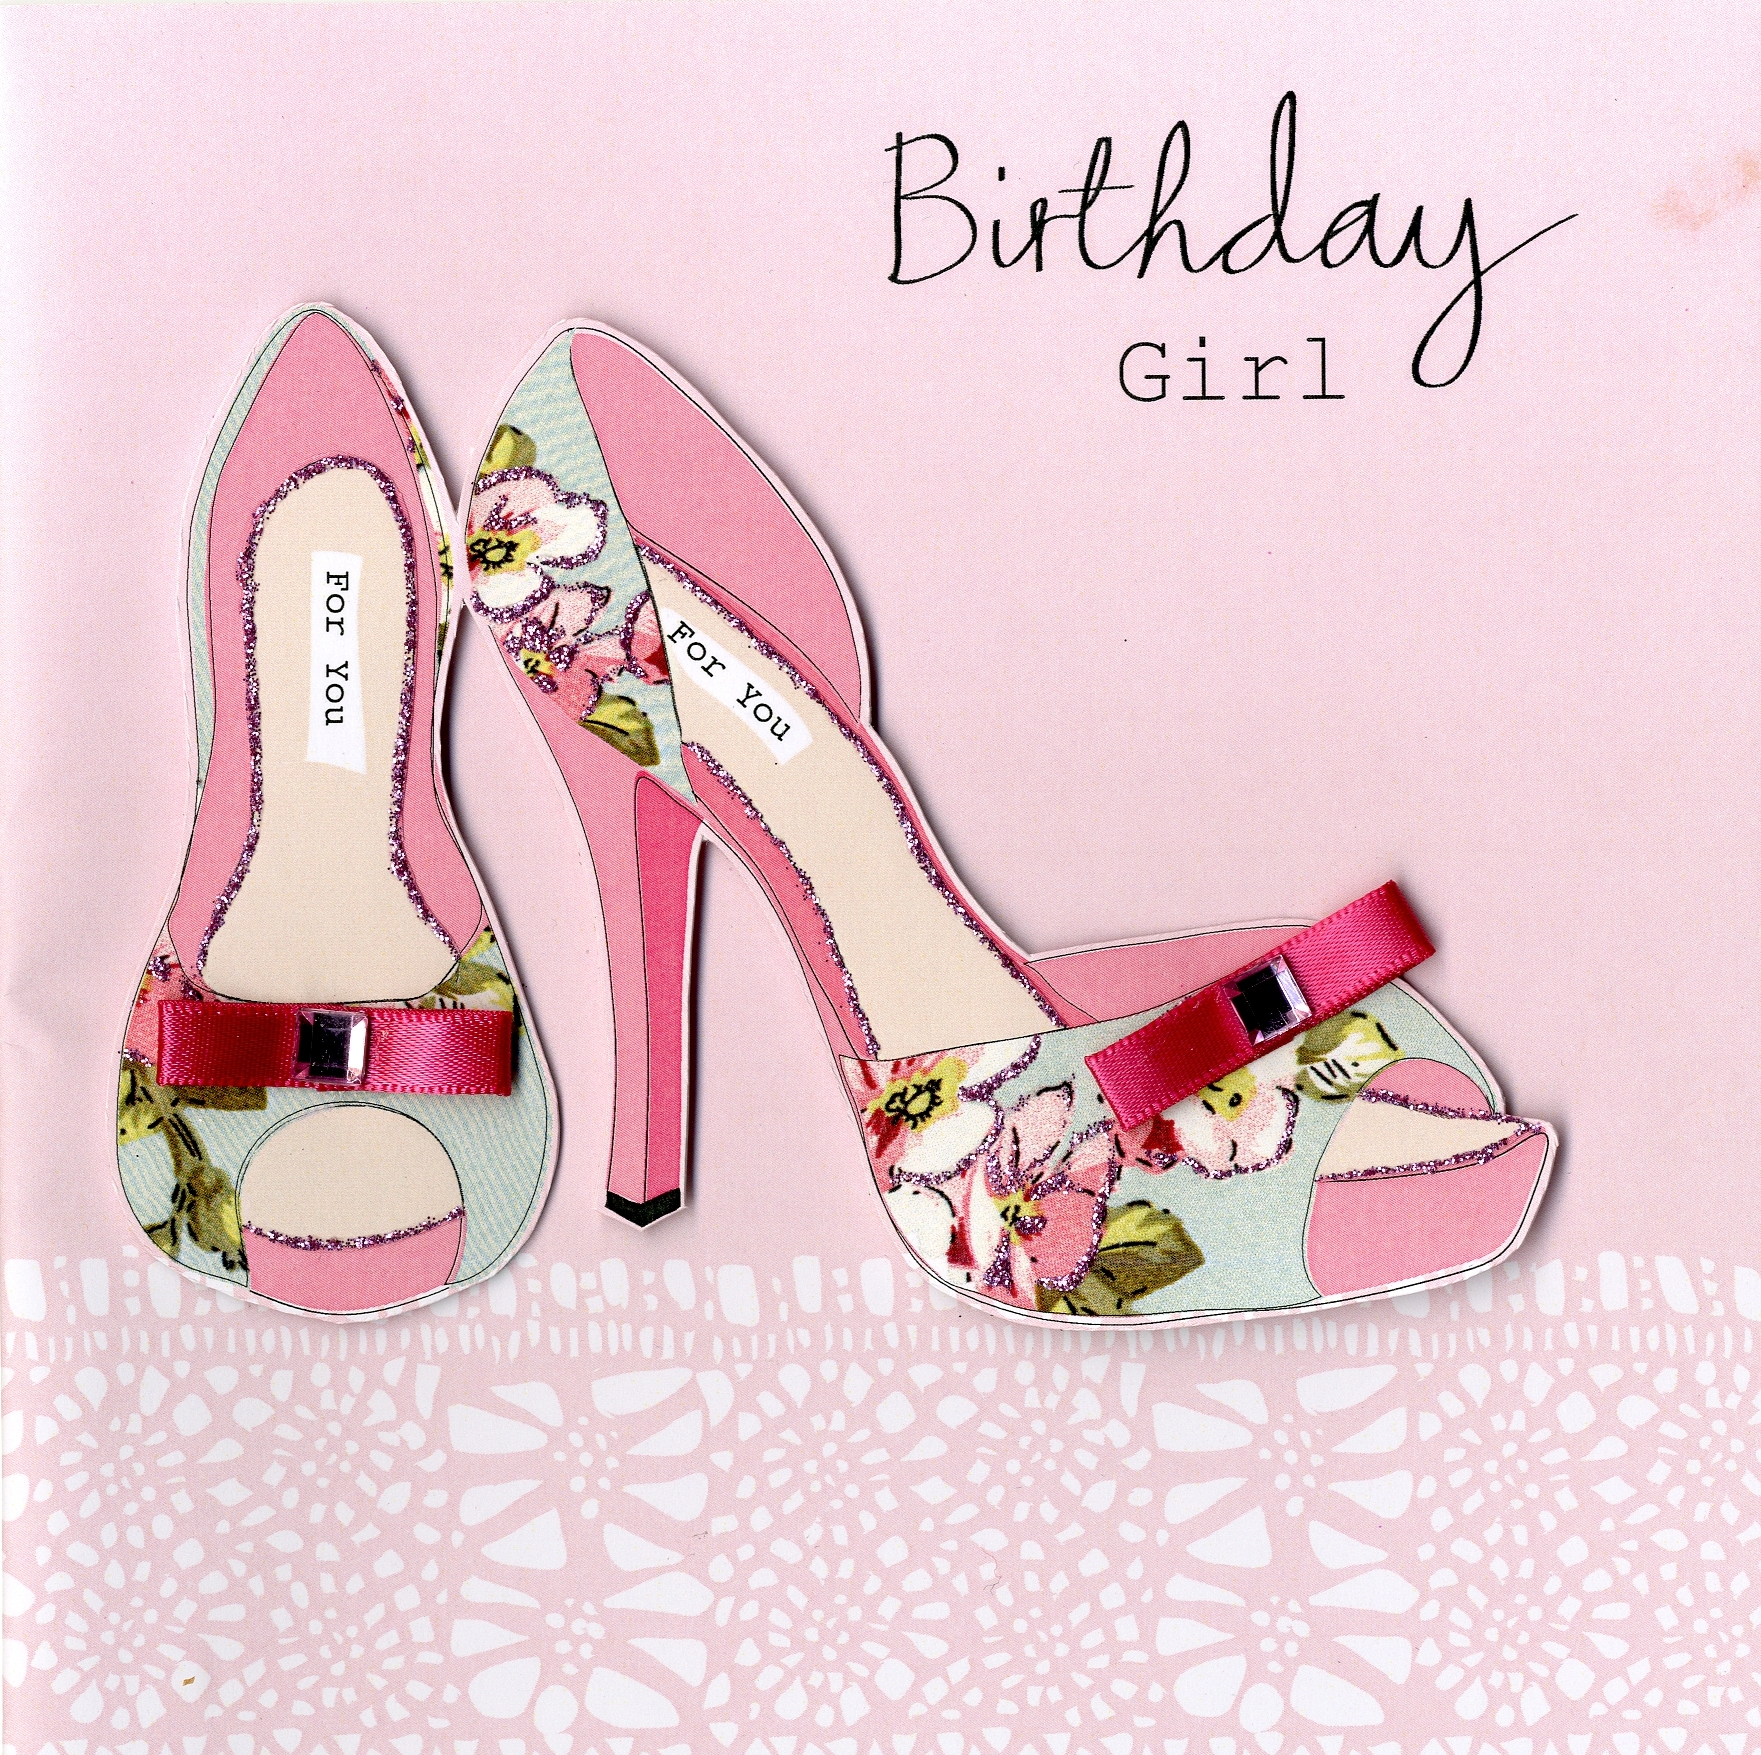 Embellished Birthday Girl Card